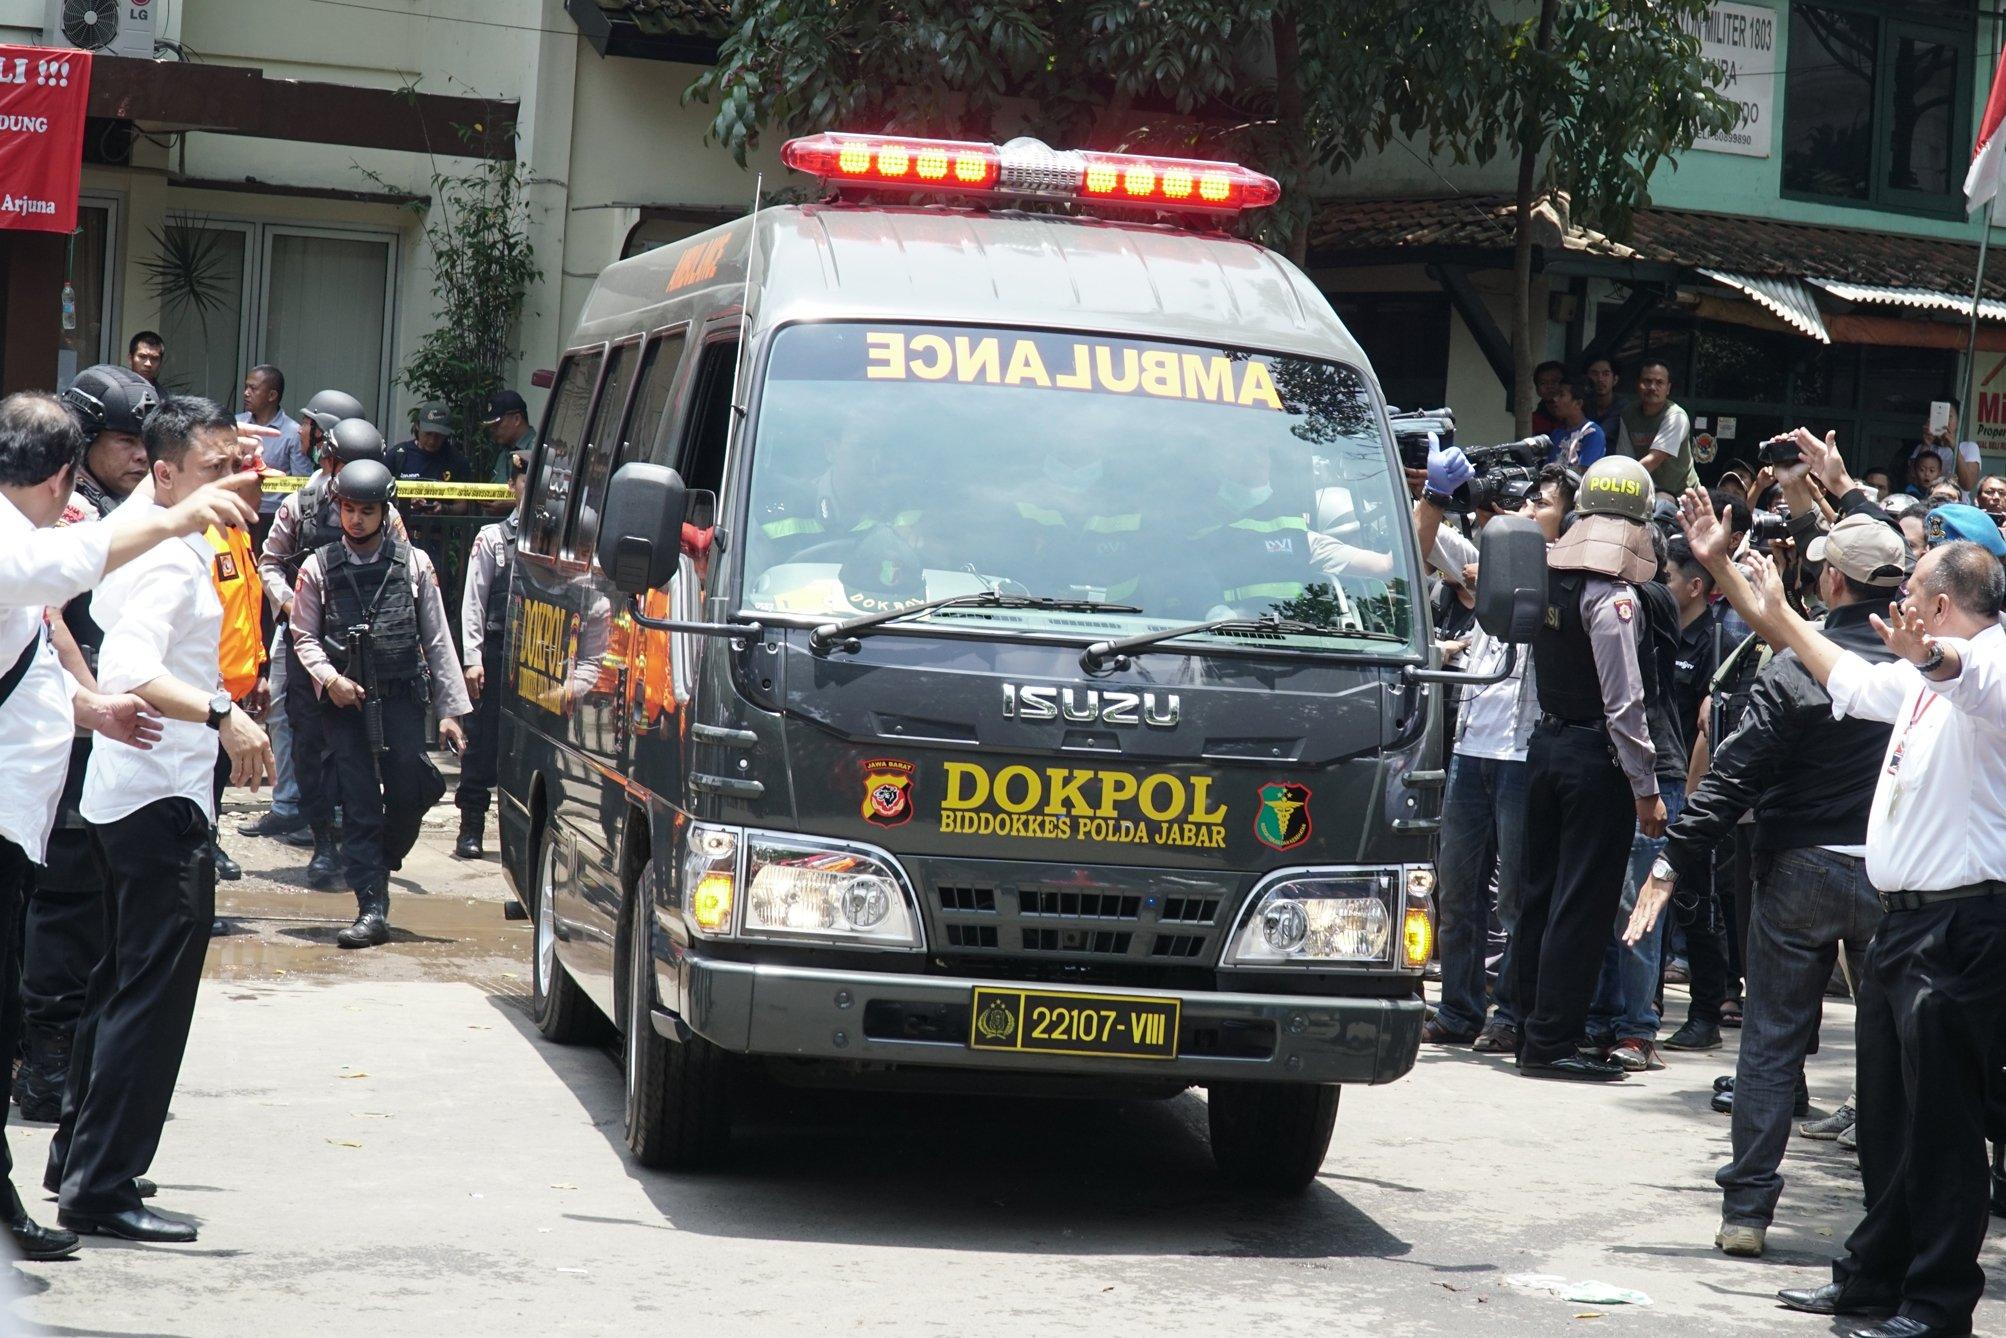 Ambulans membawa terduga teroris keluar dari kantor Kelurahan Arjuna, Cicendo, Bandung, Jawa Barat, Senin (27/2). Pelaku teror bom, YC, tewas dalam perjalanan saat hendak dibawa ke RS Bhayangkara Sartika Asih, Bandung.